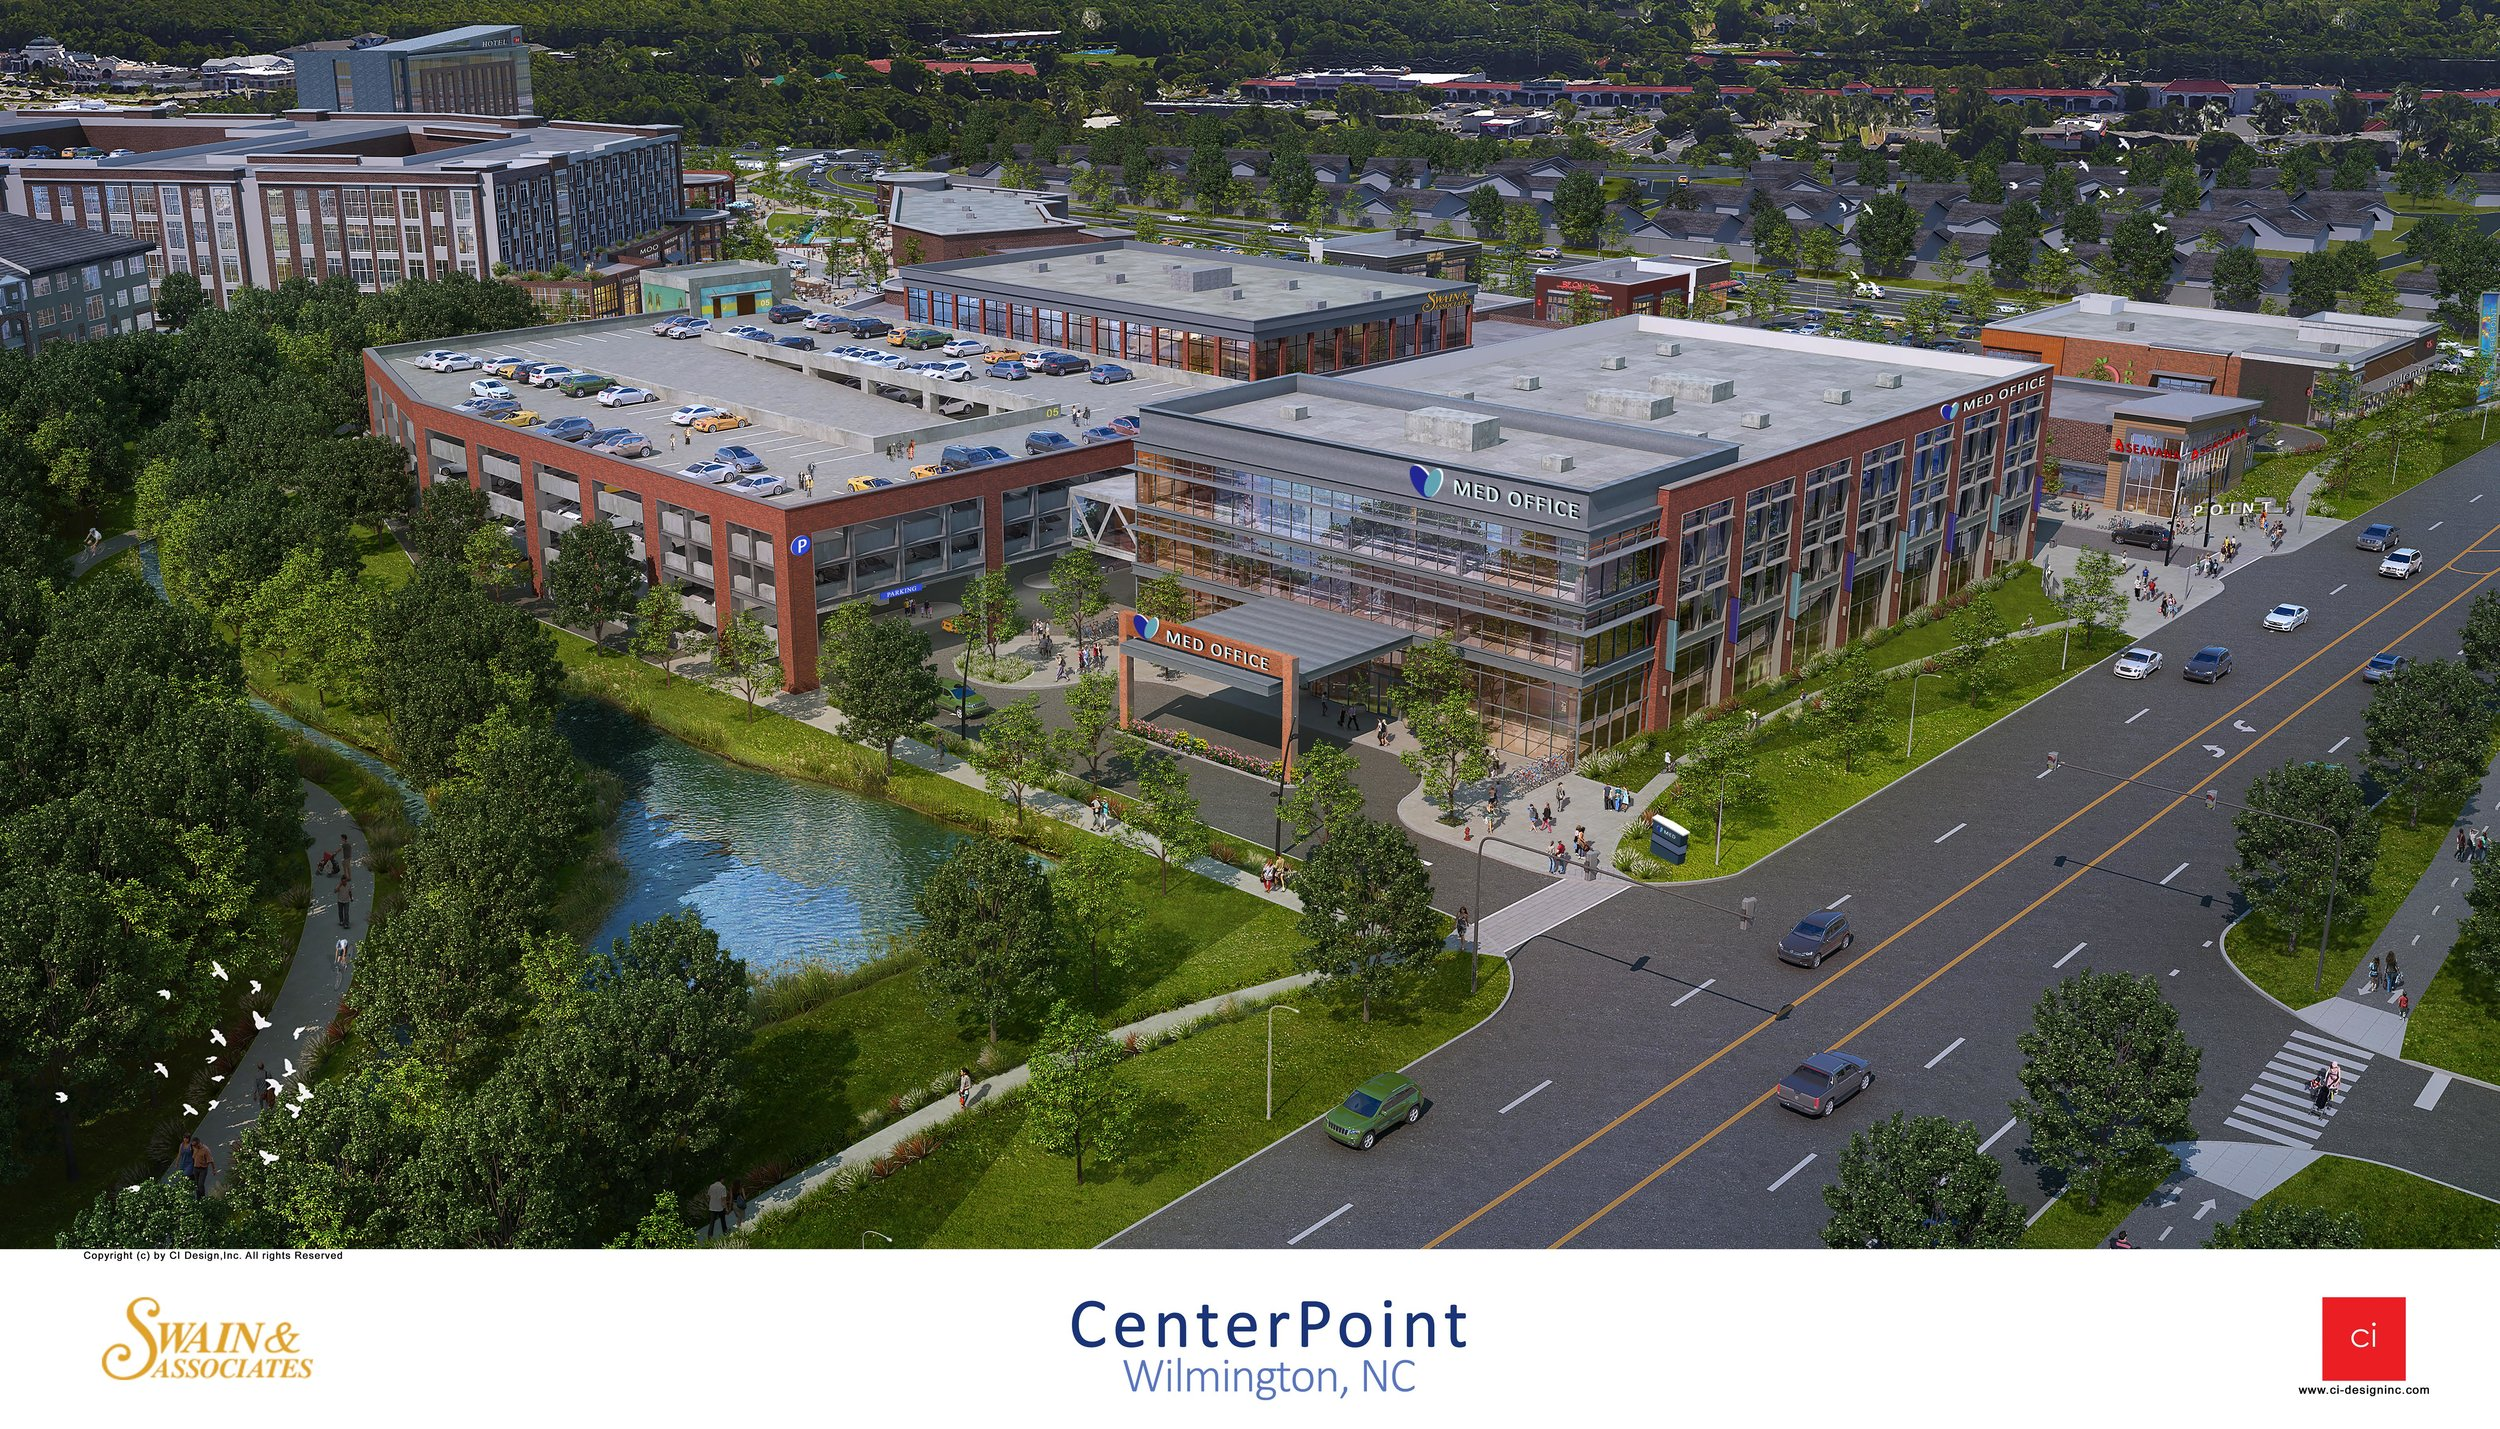 CenterPoint_A.jpg